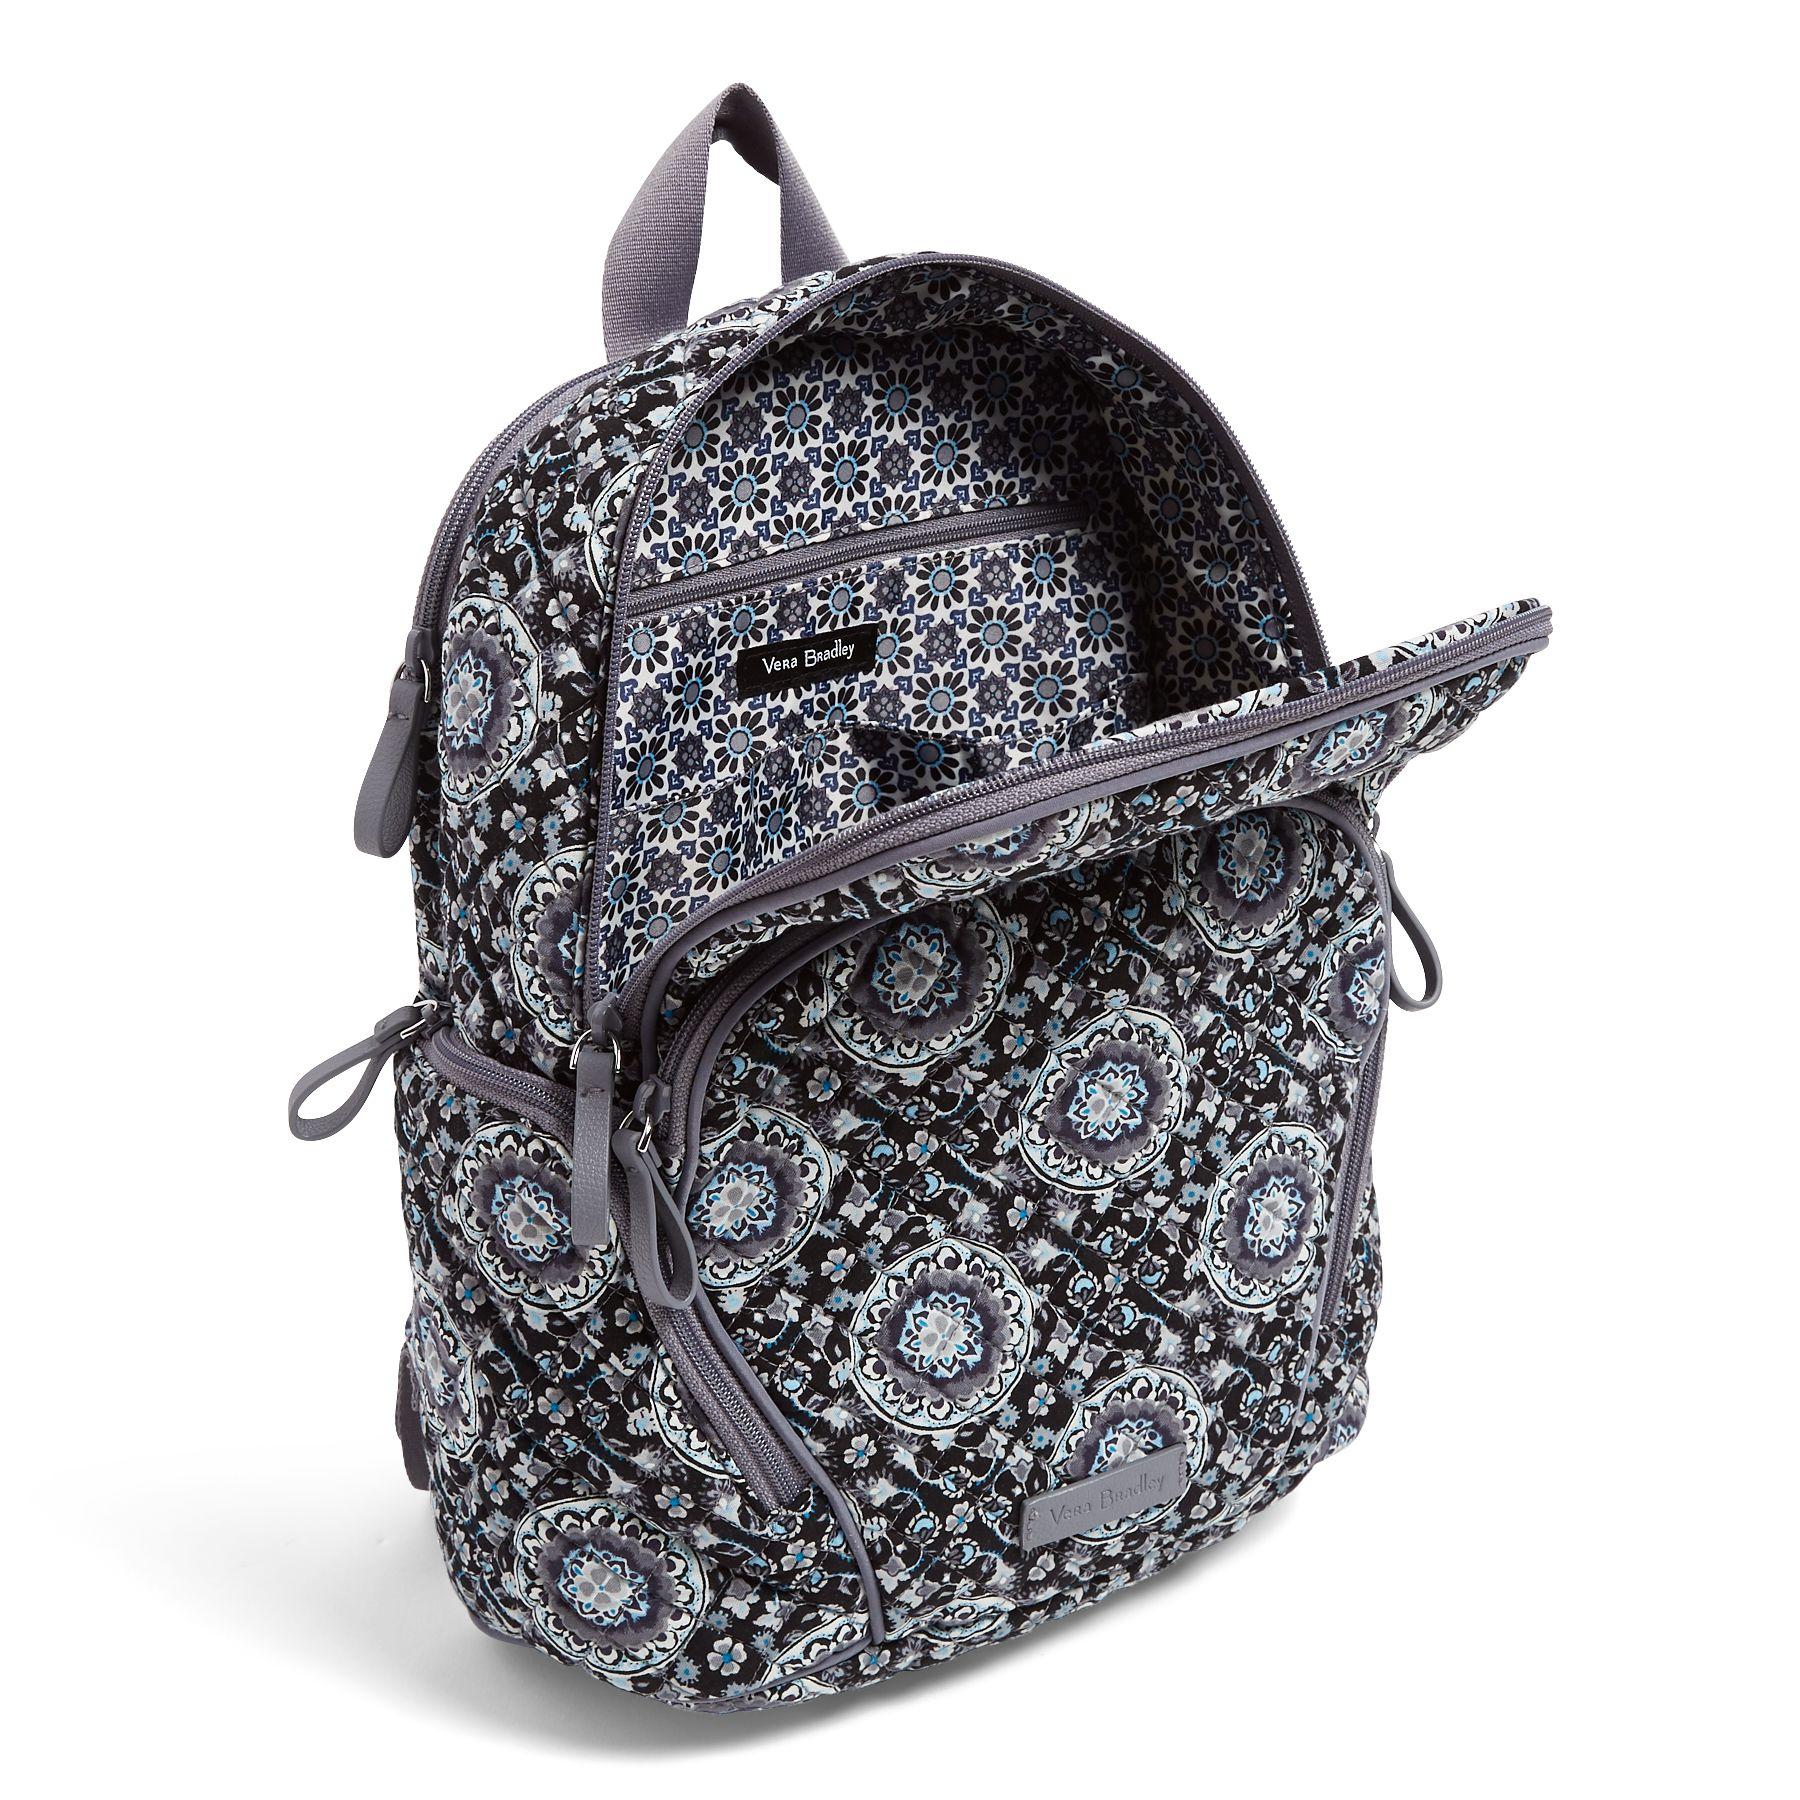 5d20dc7fb63 Hadley Backpack